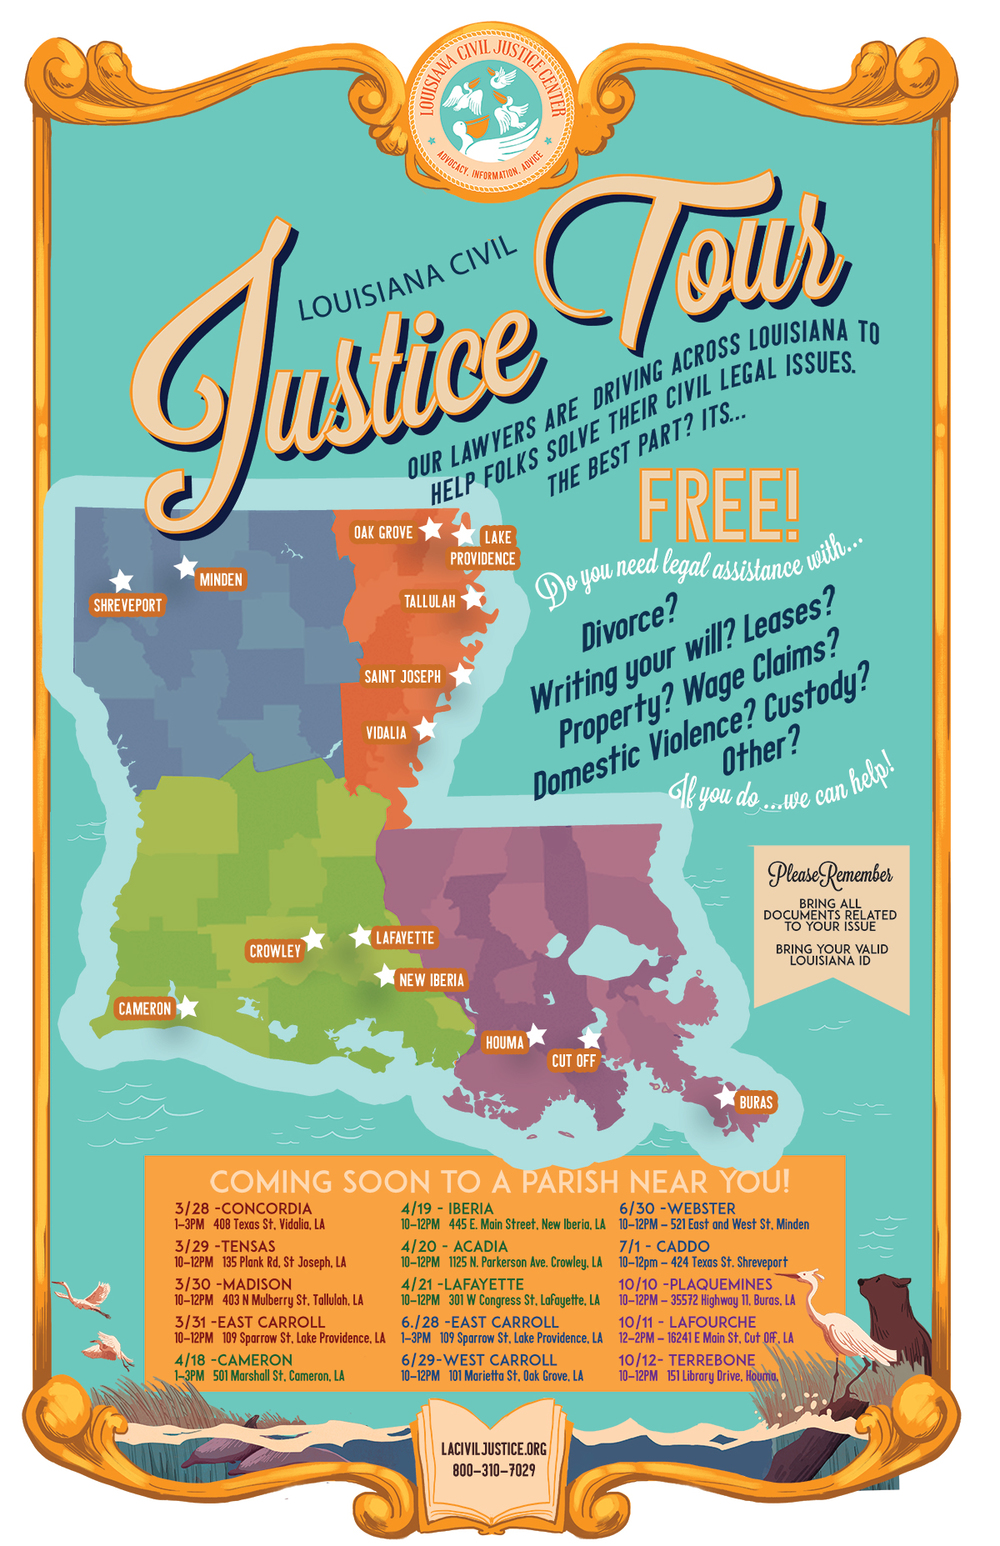 Louisiana Civil Justice Tour Poster